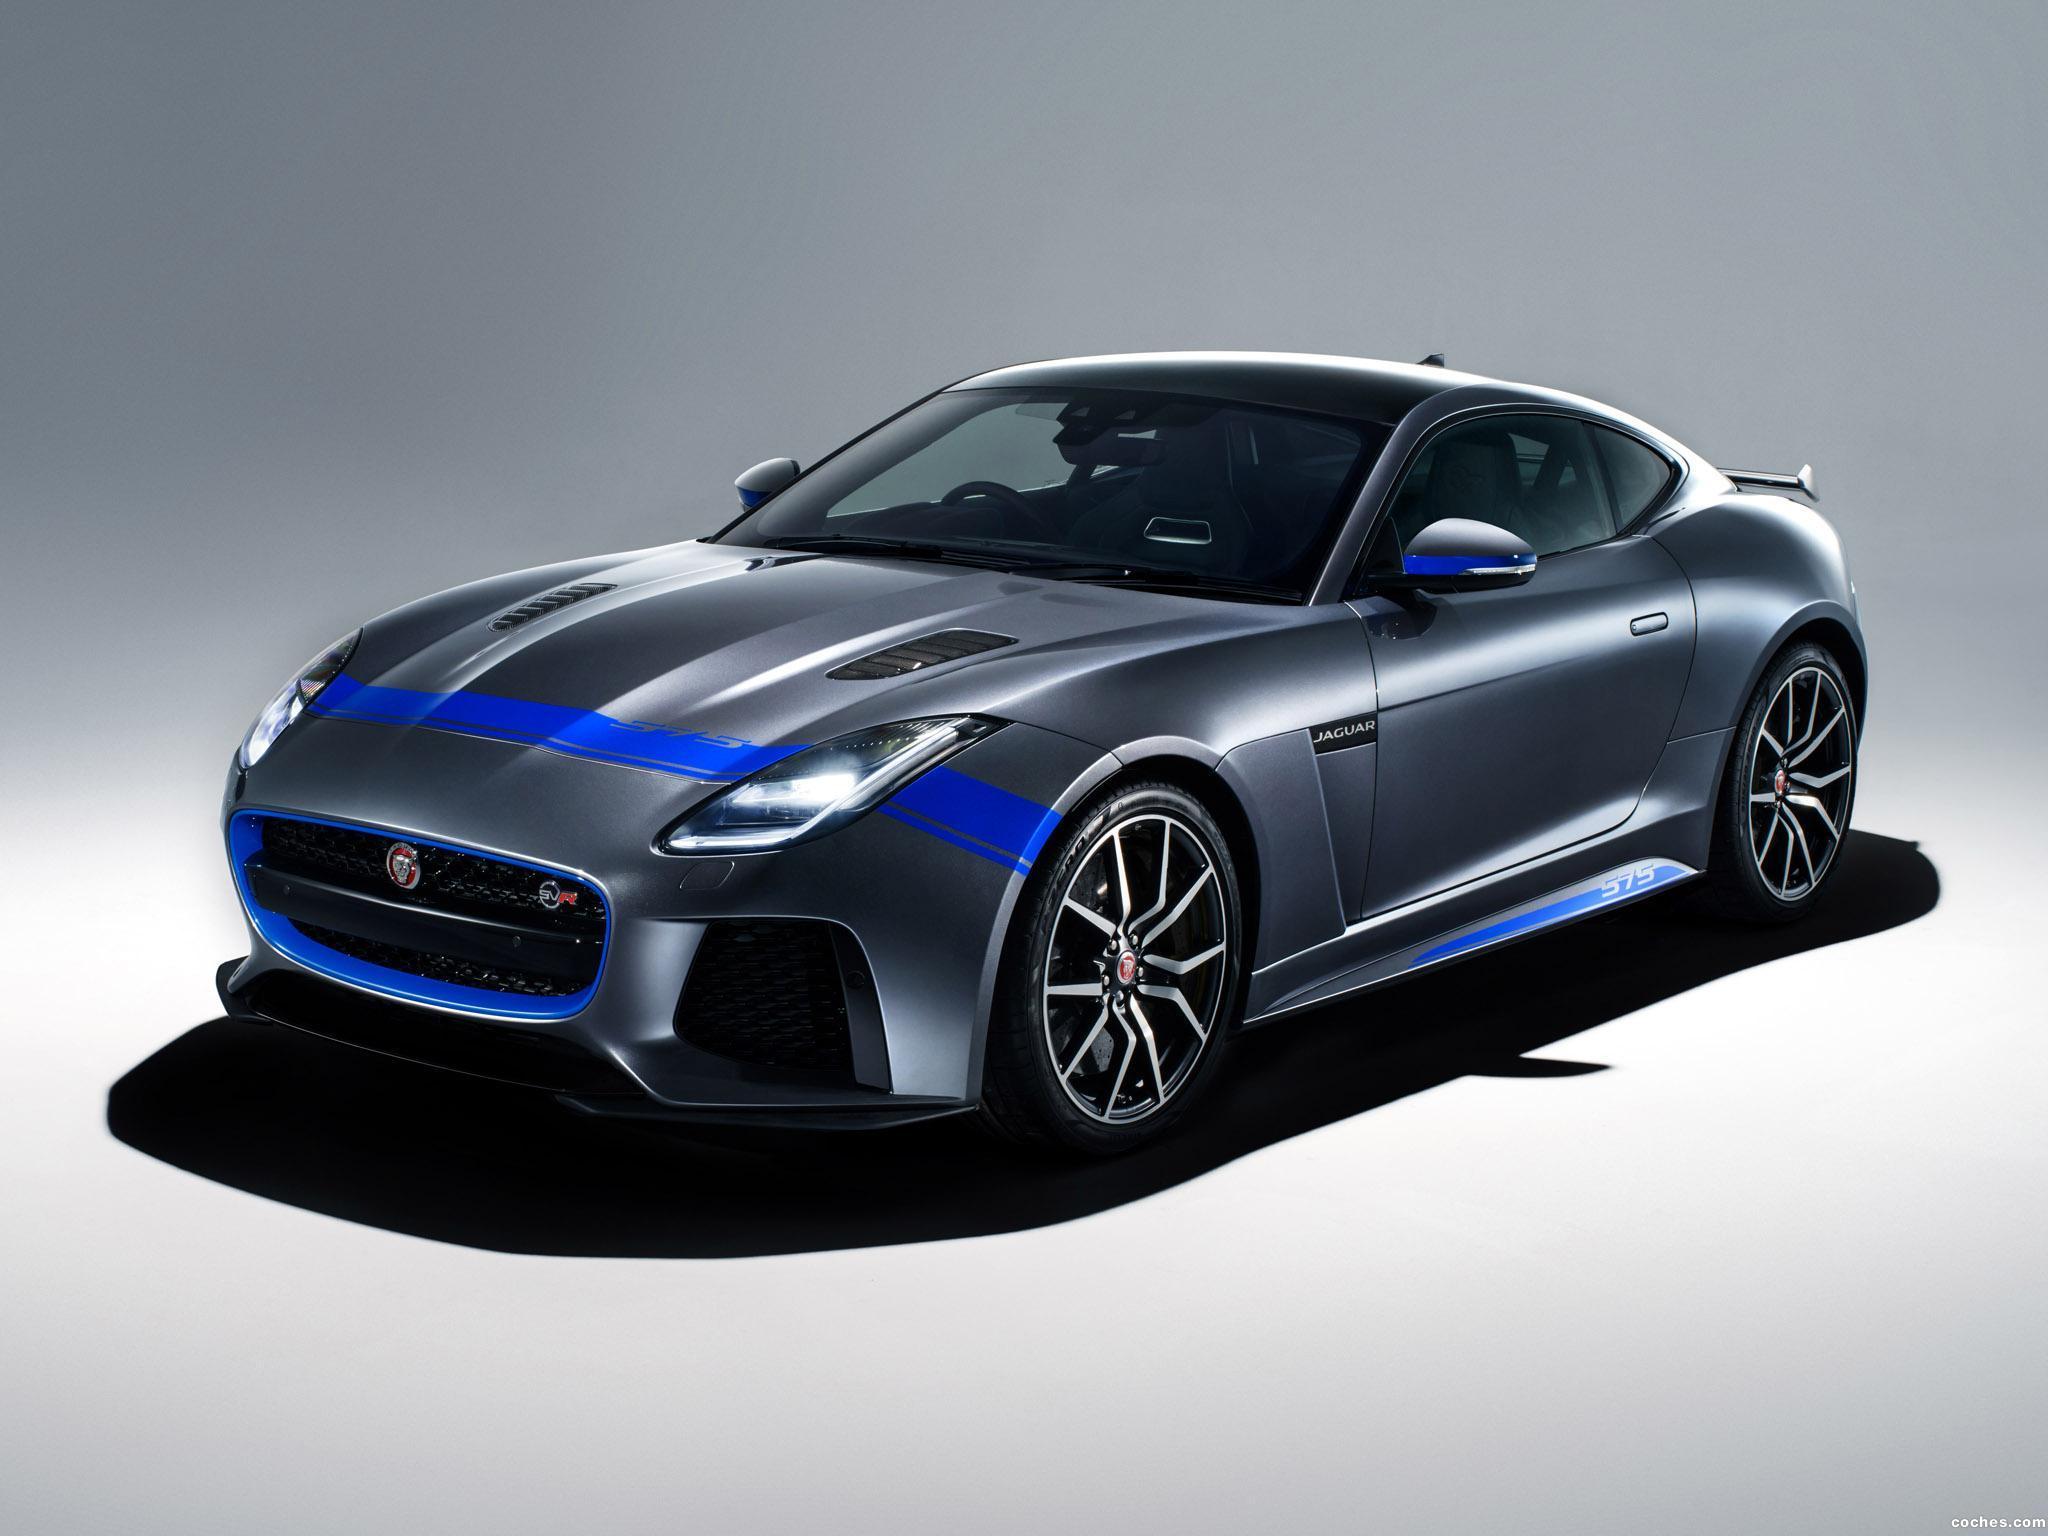 jaguar_f-type-svr-graphic-pack-coupe-2018_r14.jpg